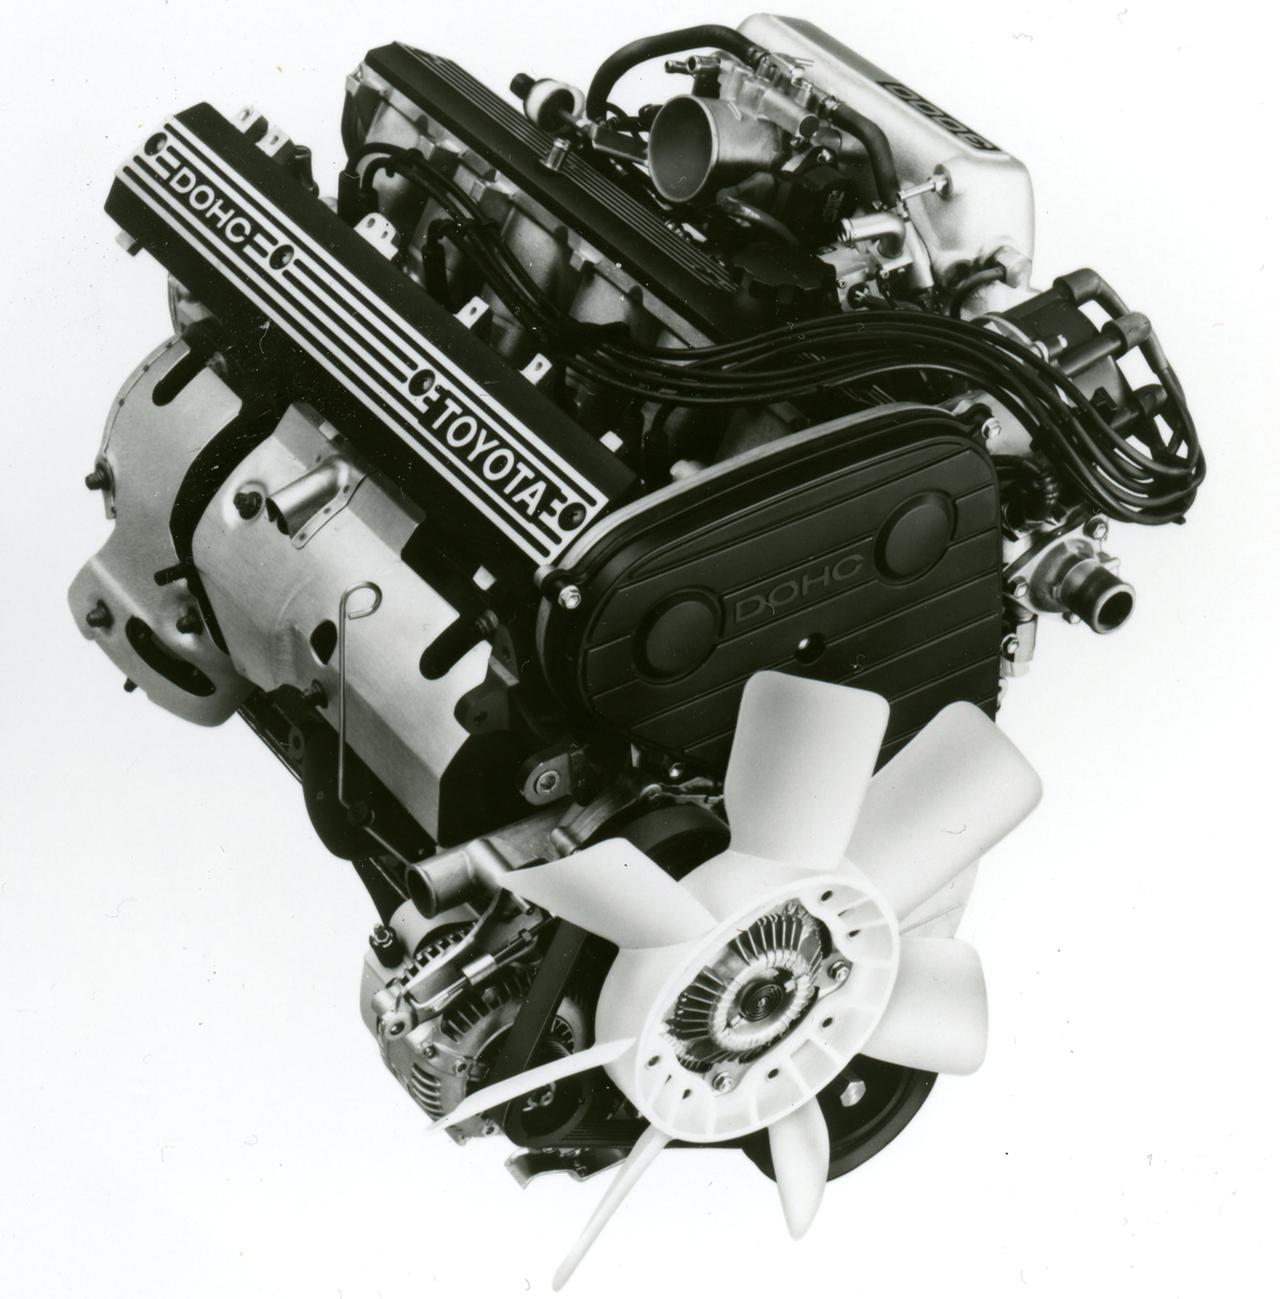 Images : 2番目の画像 - 新時代を切り拓いた初代ソアラと5M-GEU型エンジン - LAWRENCE - Motorcycle x Cars + α = Your Life.